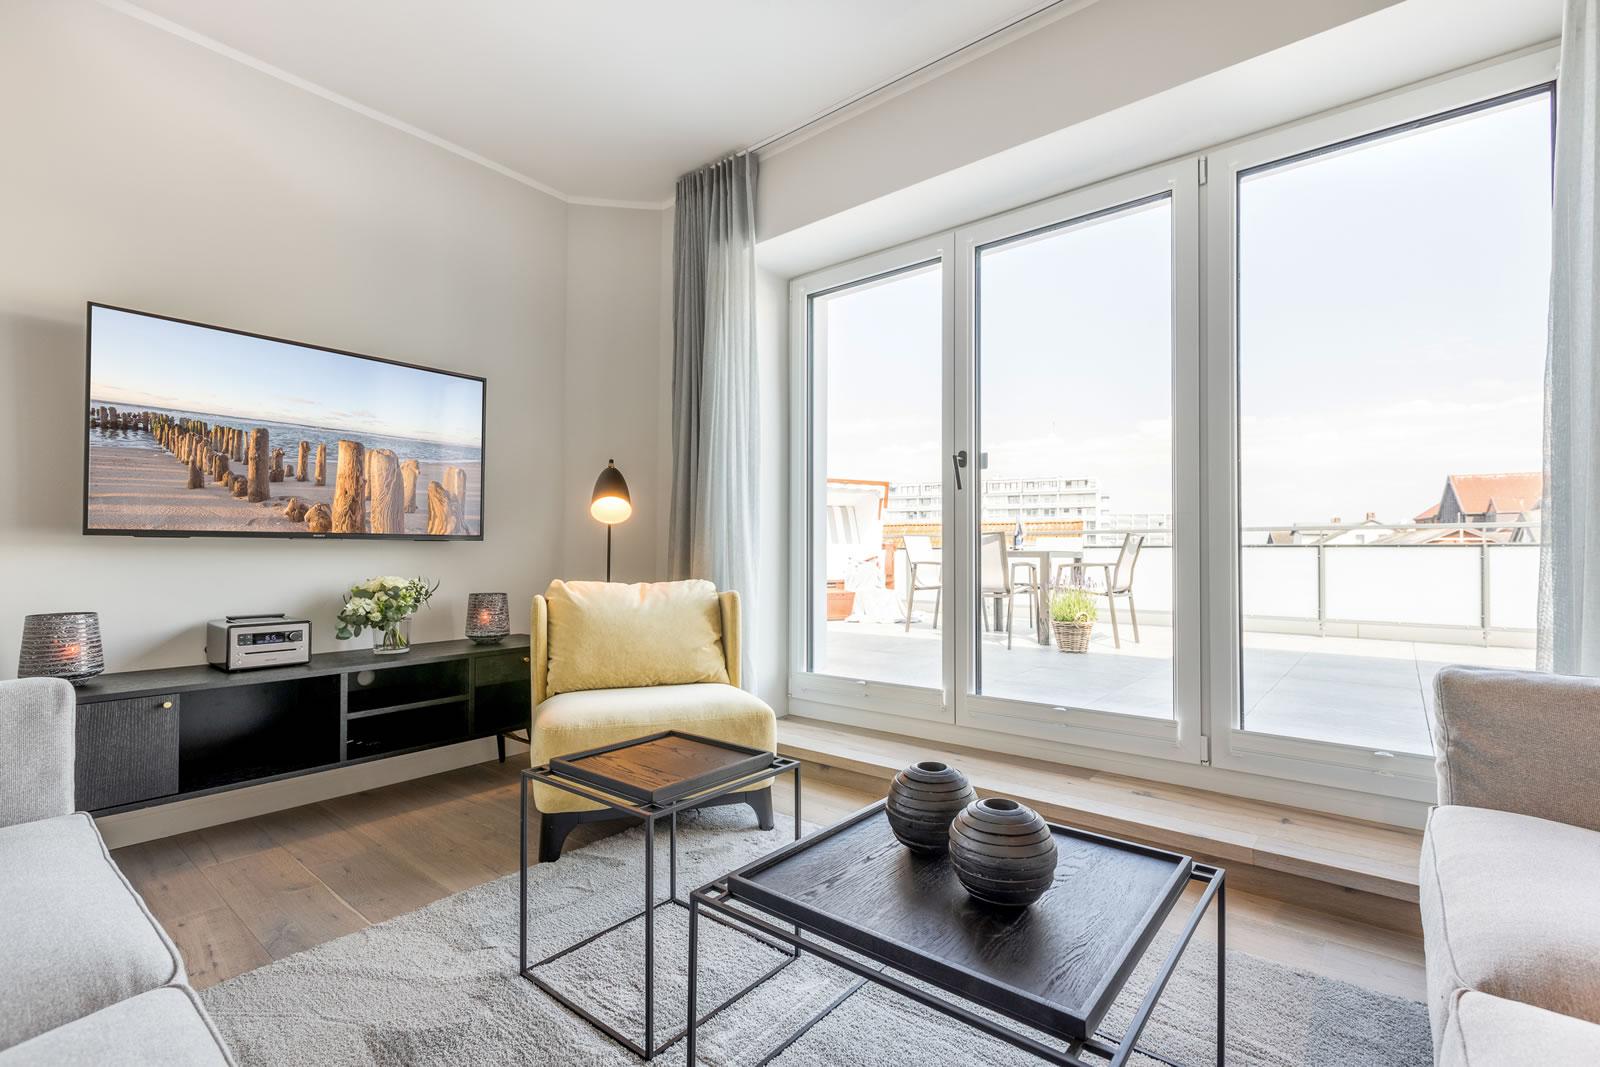 Sylter-Stadtperle-Wohnung-5-14